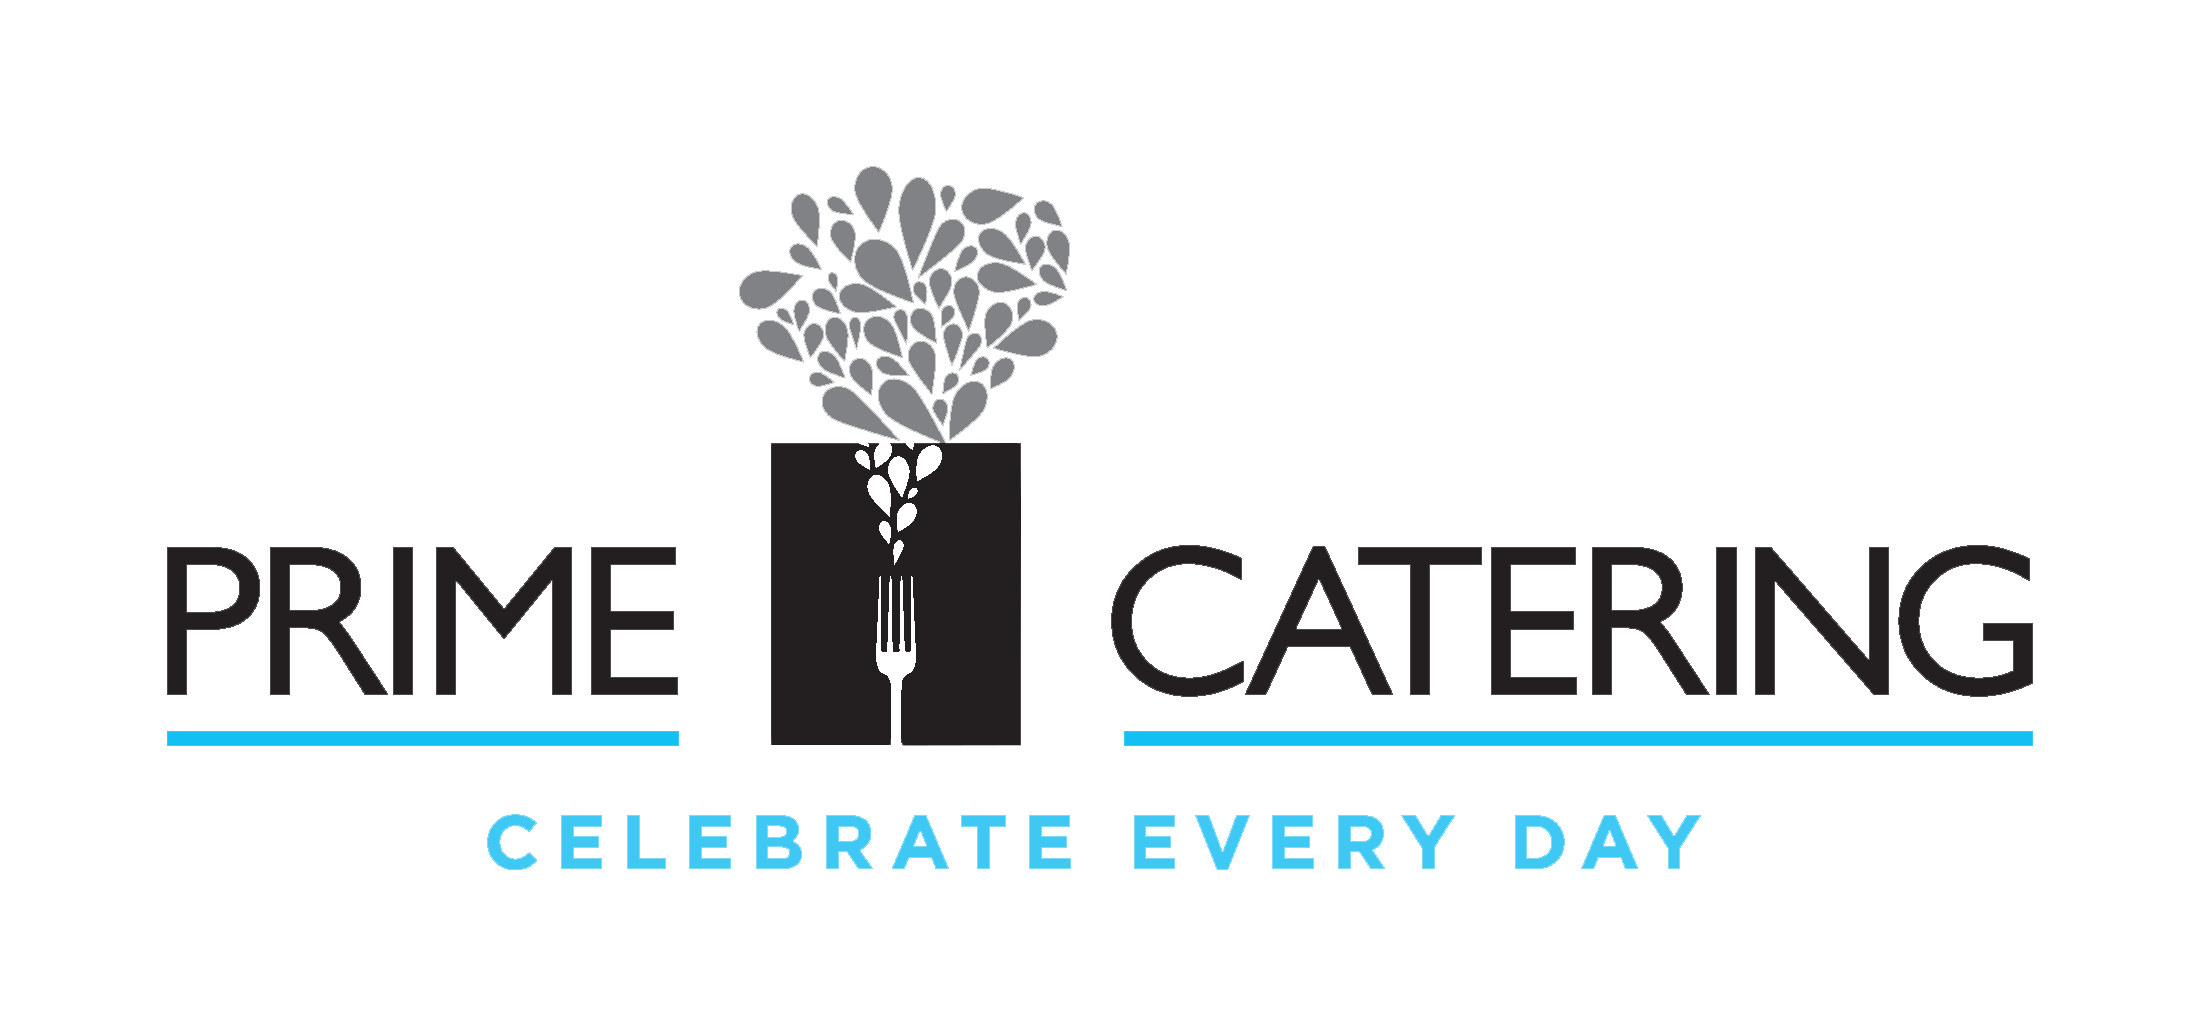 Prime_Catering_blue_celebrate_transparent